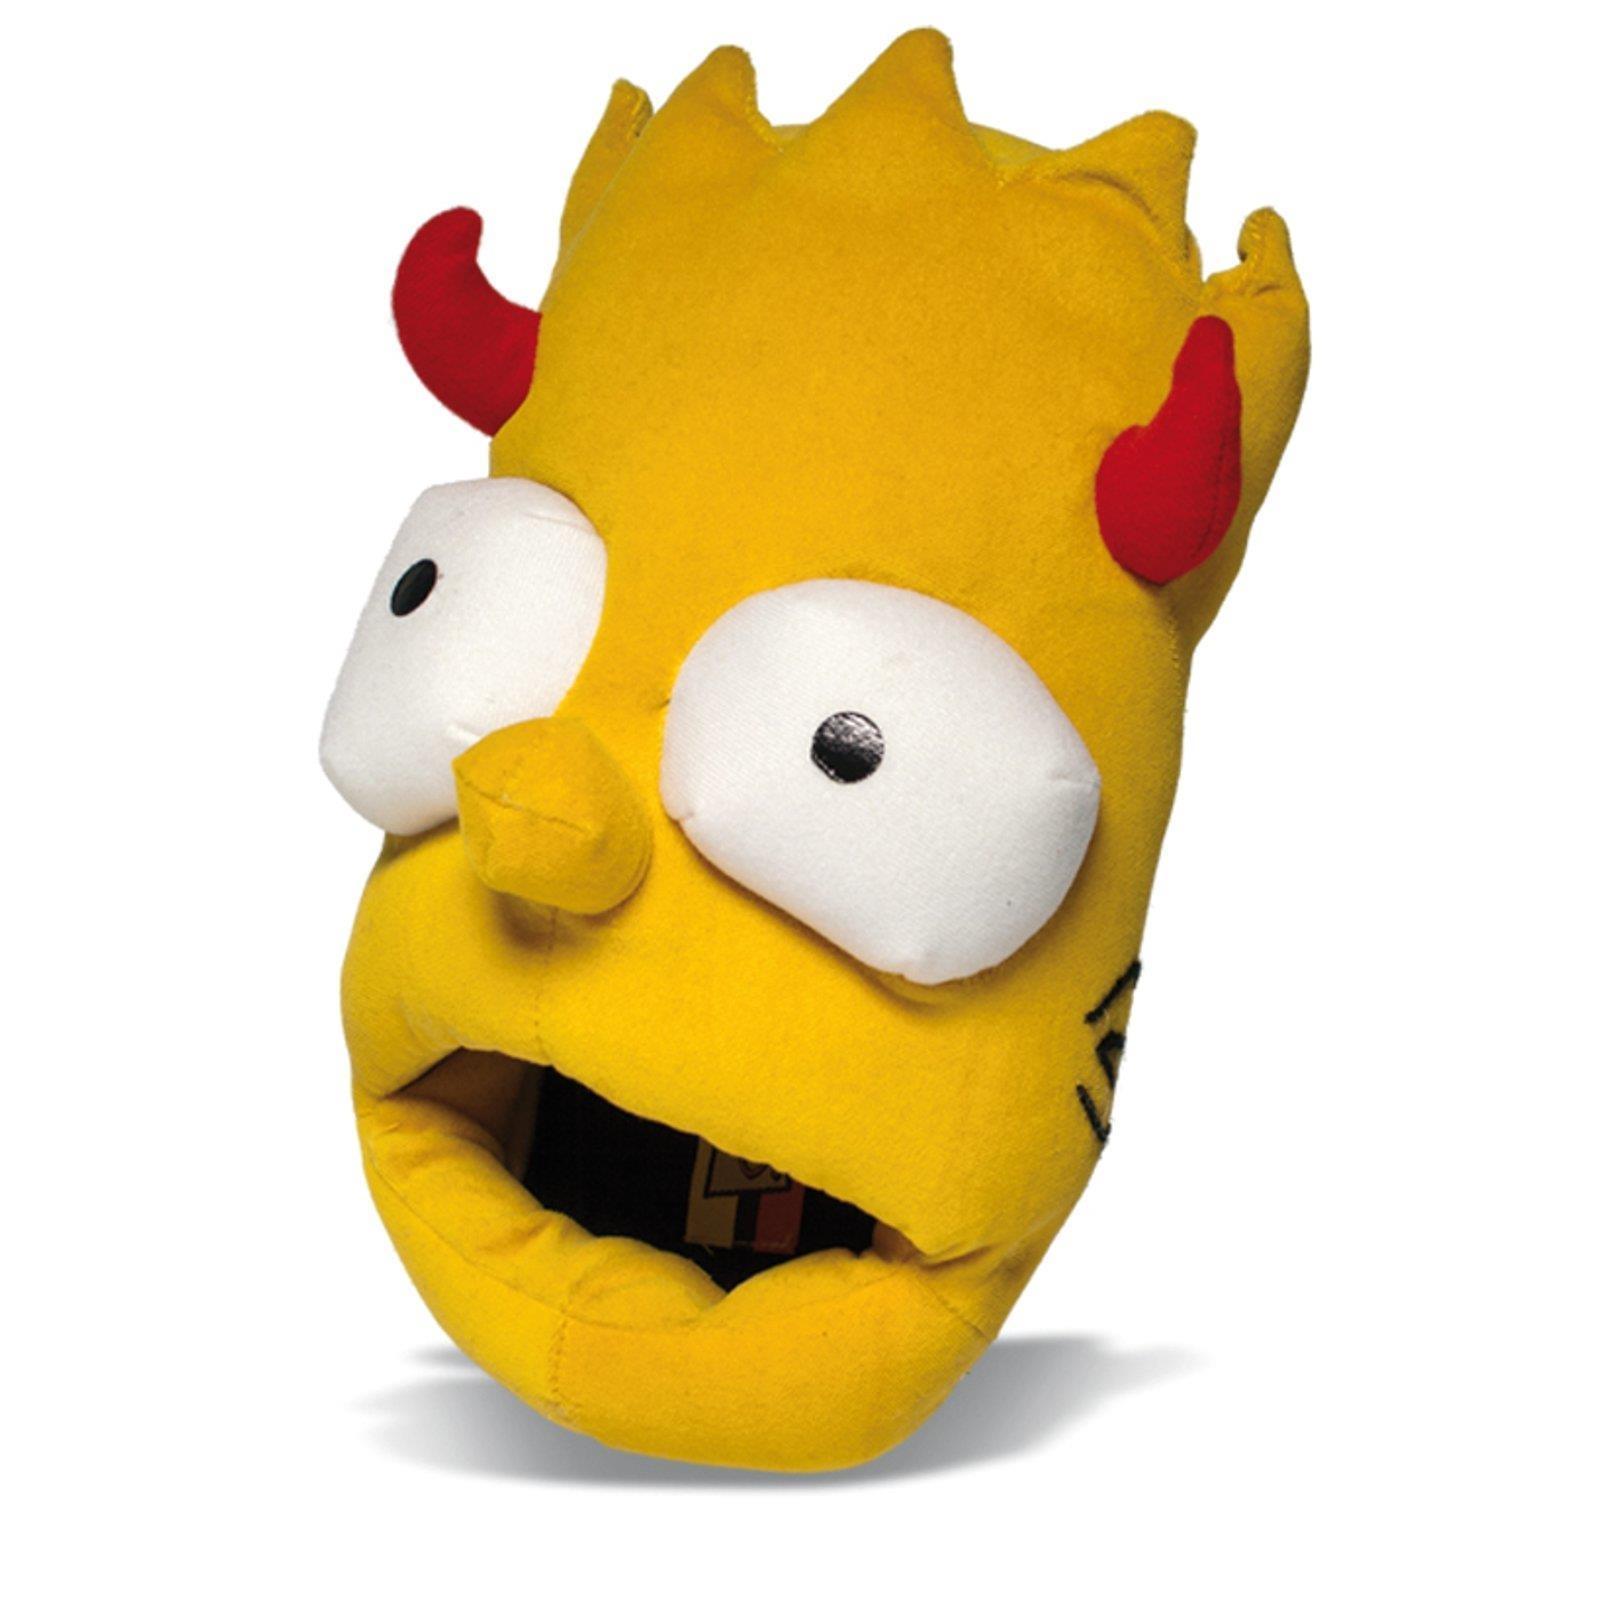 DIE-SIMPSONS-Bart-Simpson-Hausschuhe-Pantoffel-Schlappen-Herren-Gelb-36-44